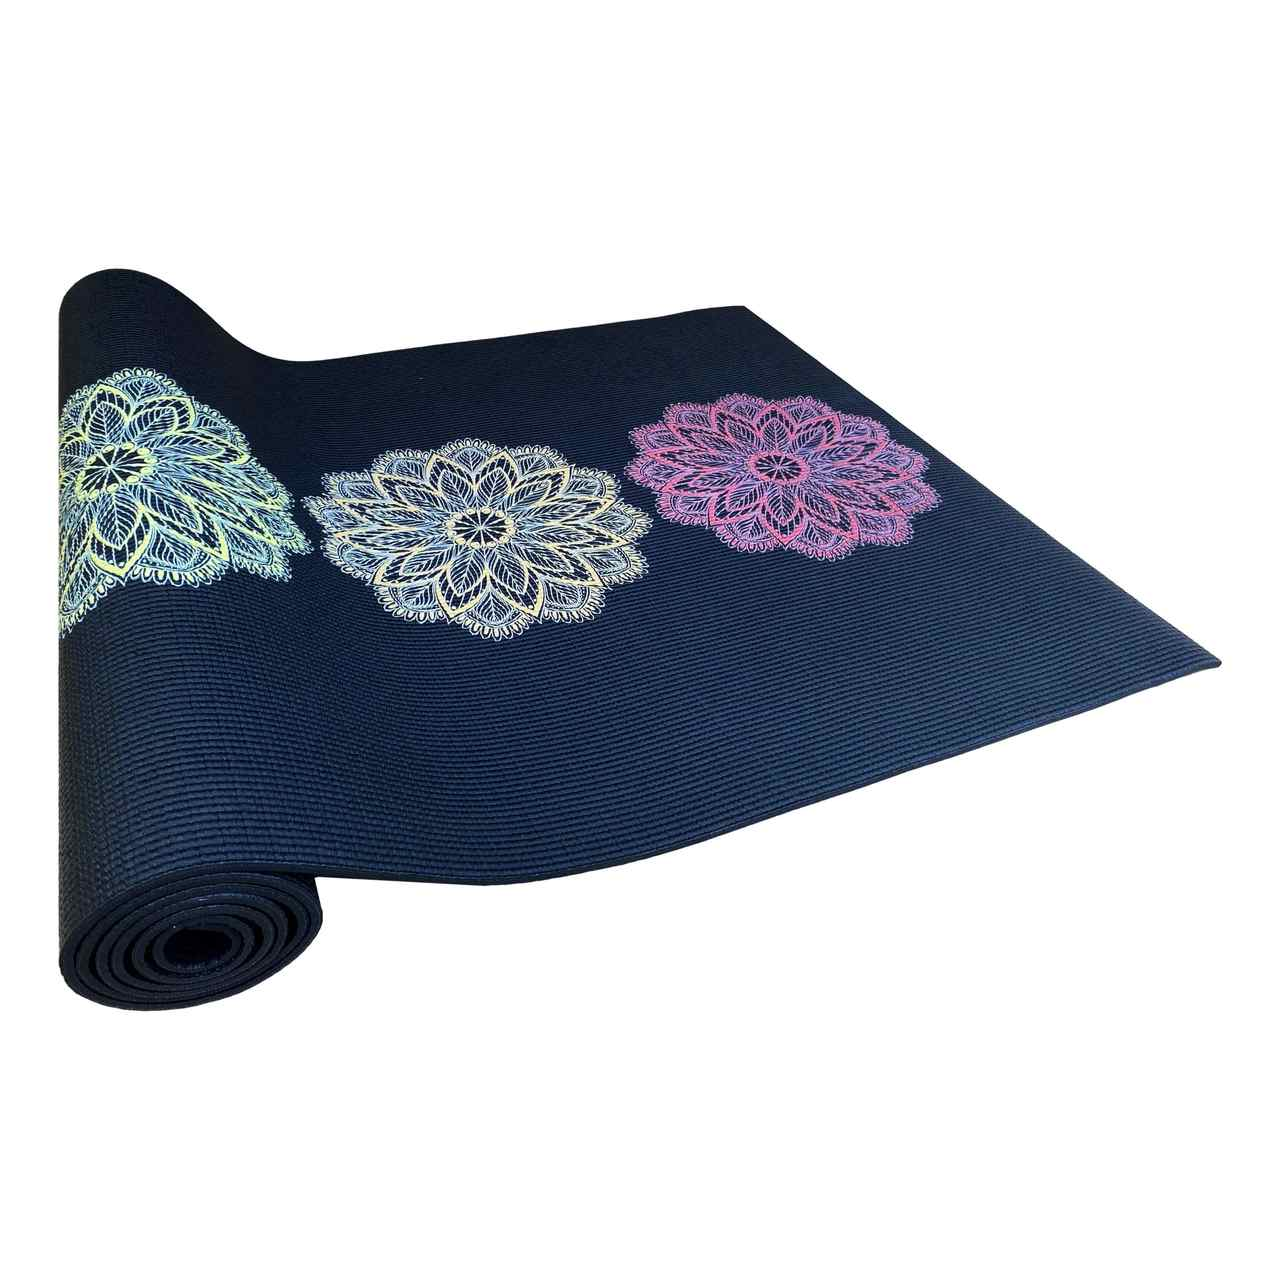 Tapete de Yoga PVC Estampado - Chakras Colorido